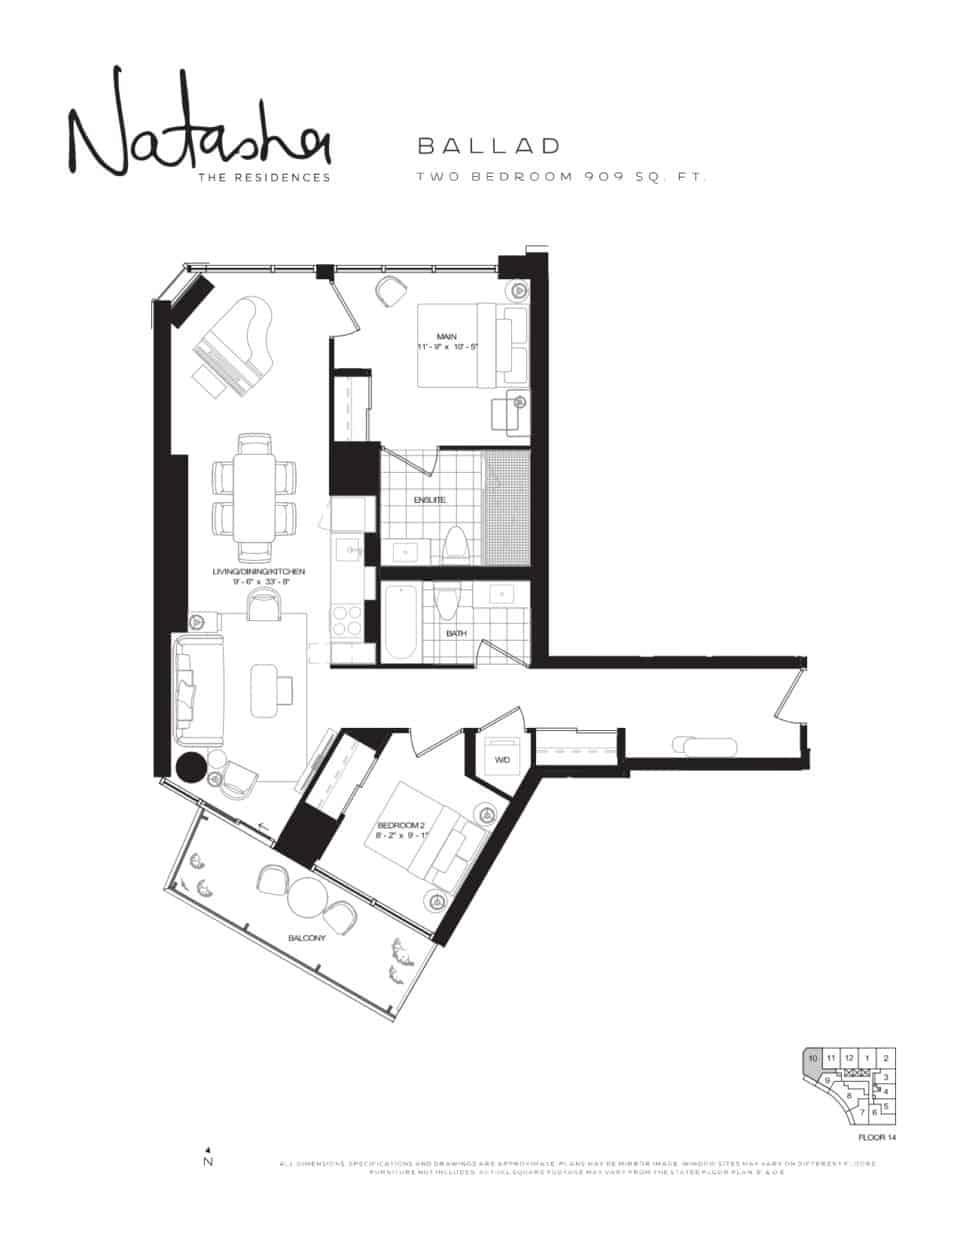 2021 09 02 11 01 56 natashatheresidences lanterradevelopments floorplans ballad